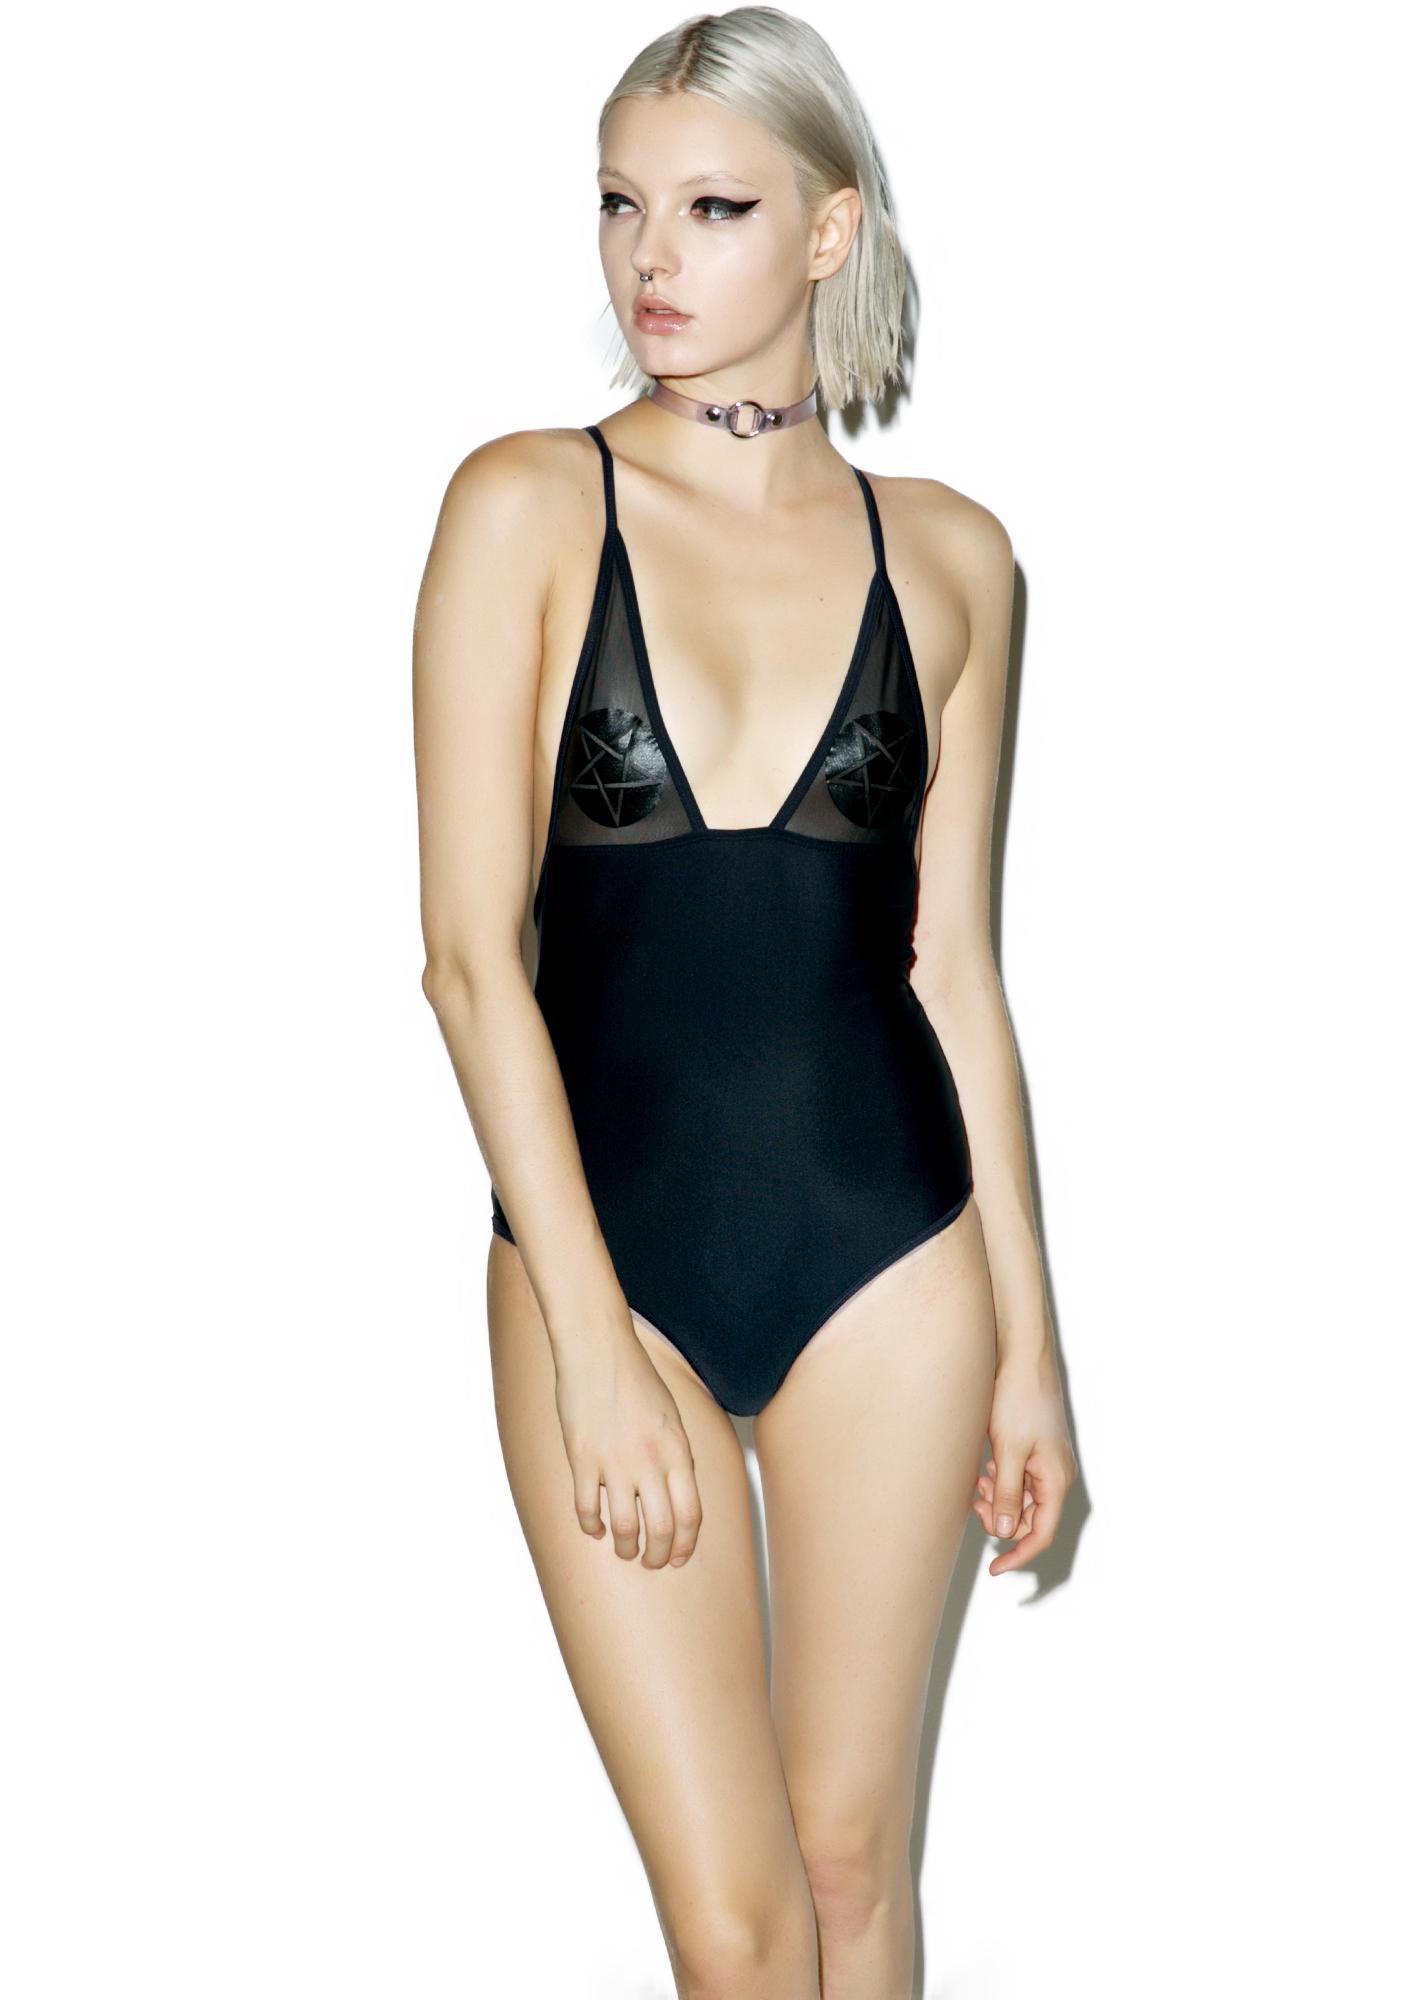 goth-lingerie-7.jpeg